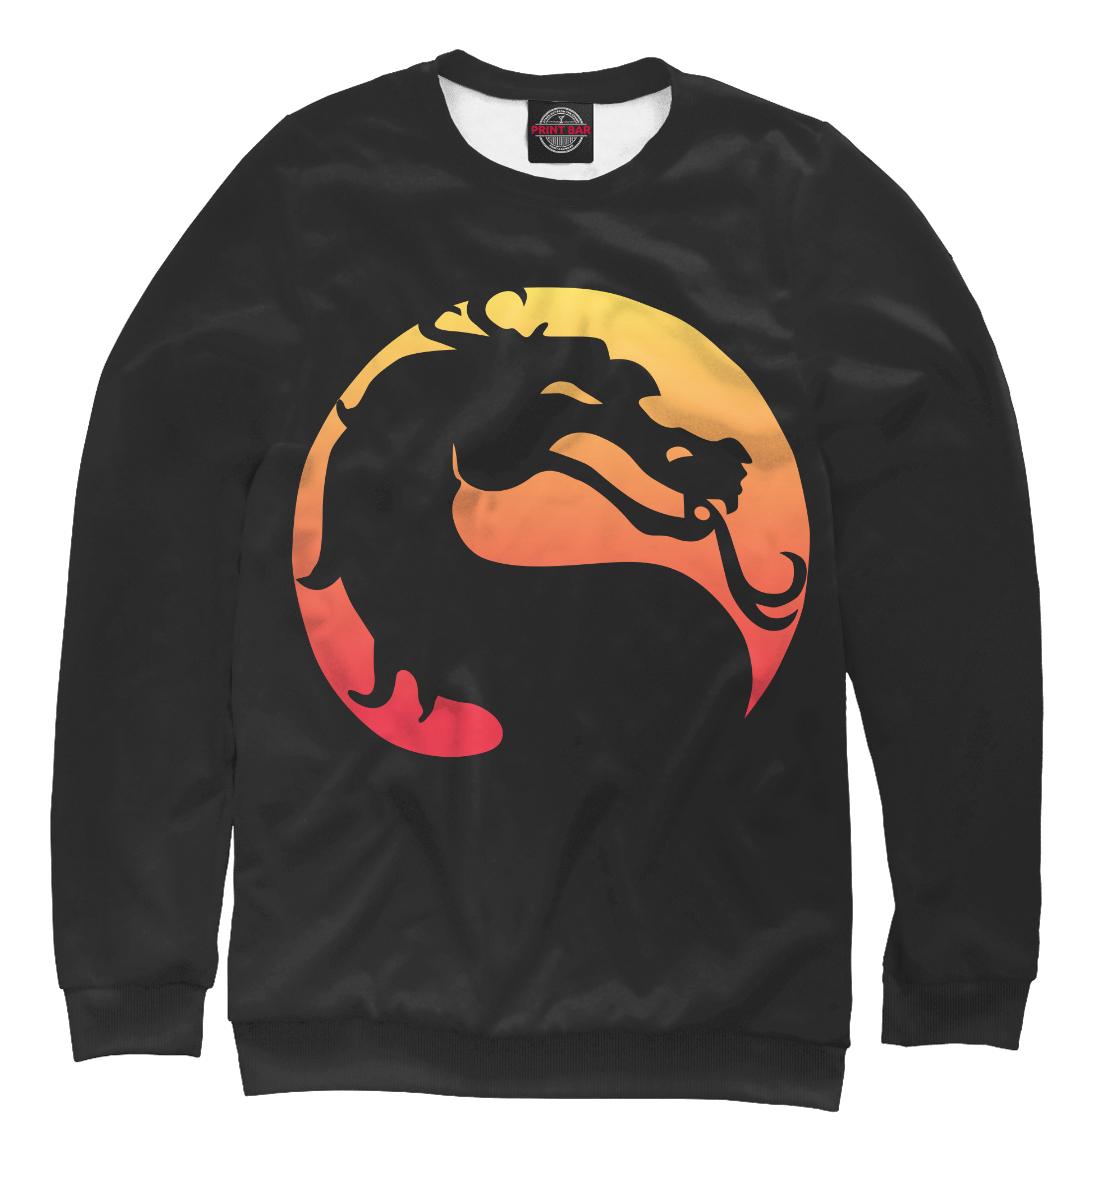 Купить Mortal Kombat, Printbar, Свитшоты, MKB-473824-swi-1